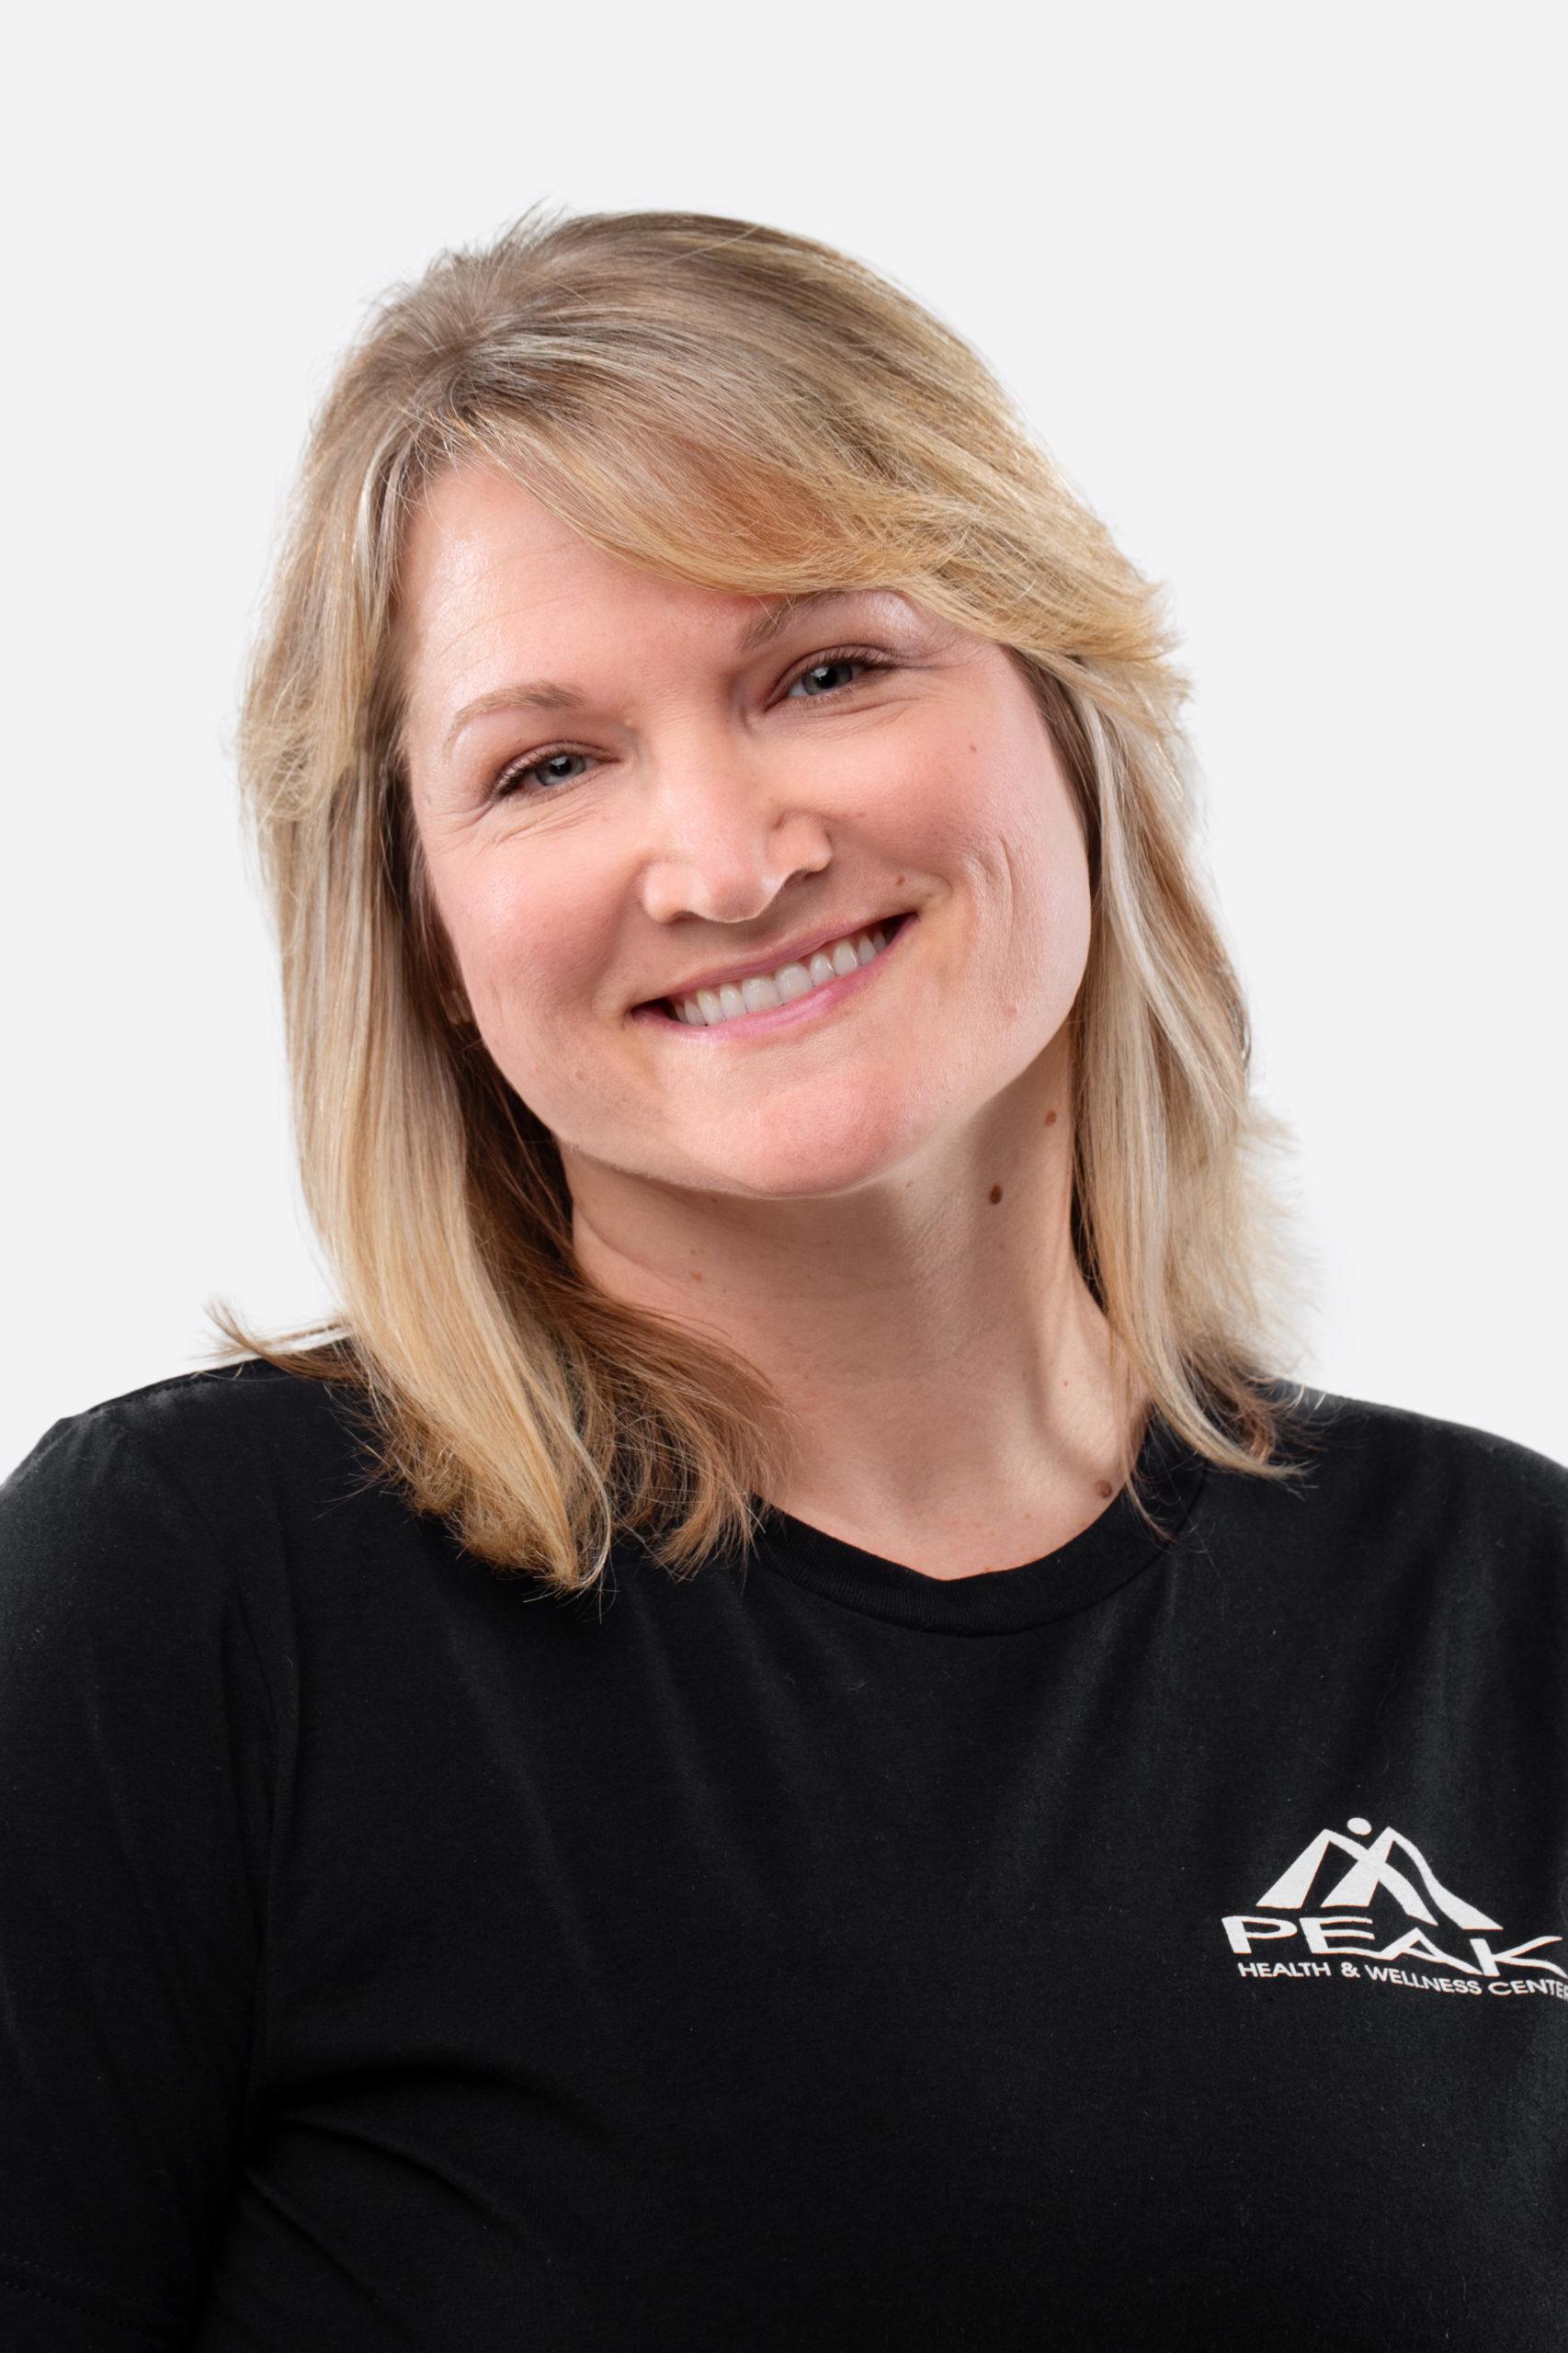 Tamara Patterson